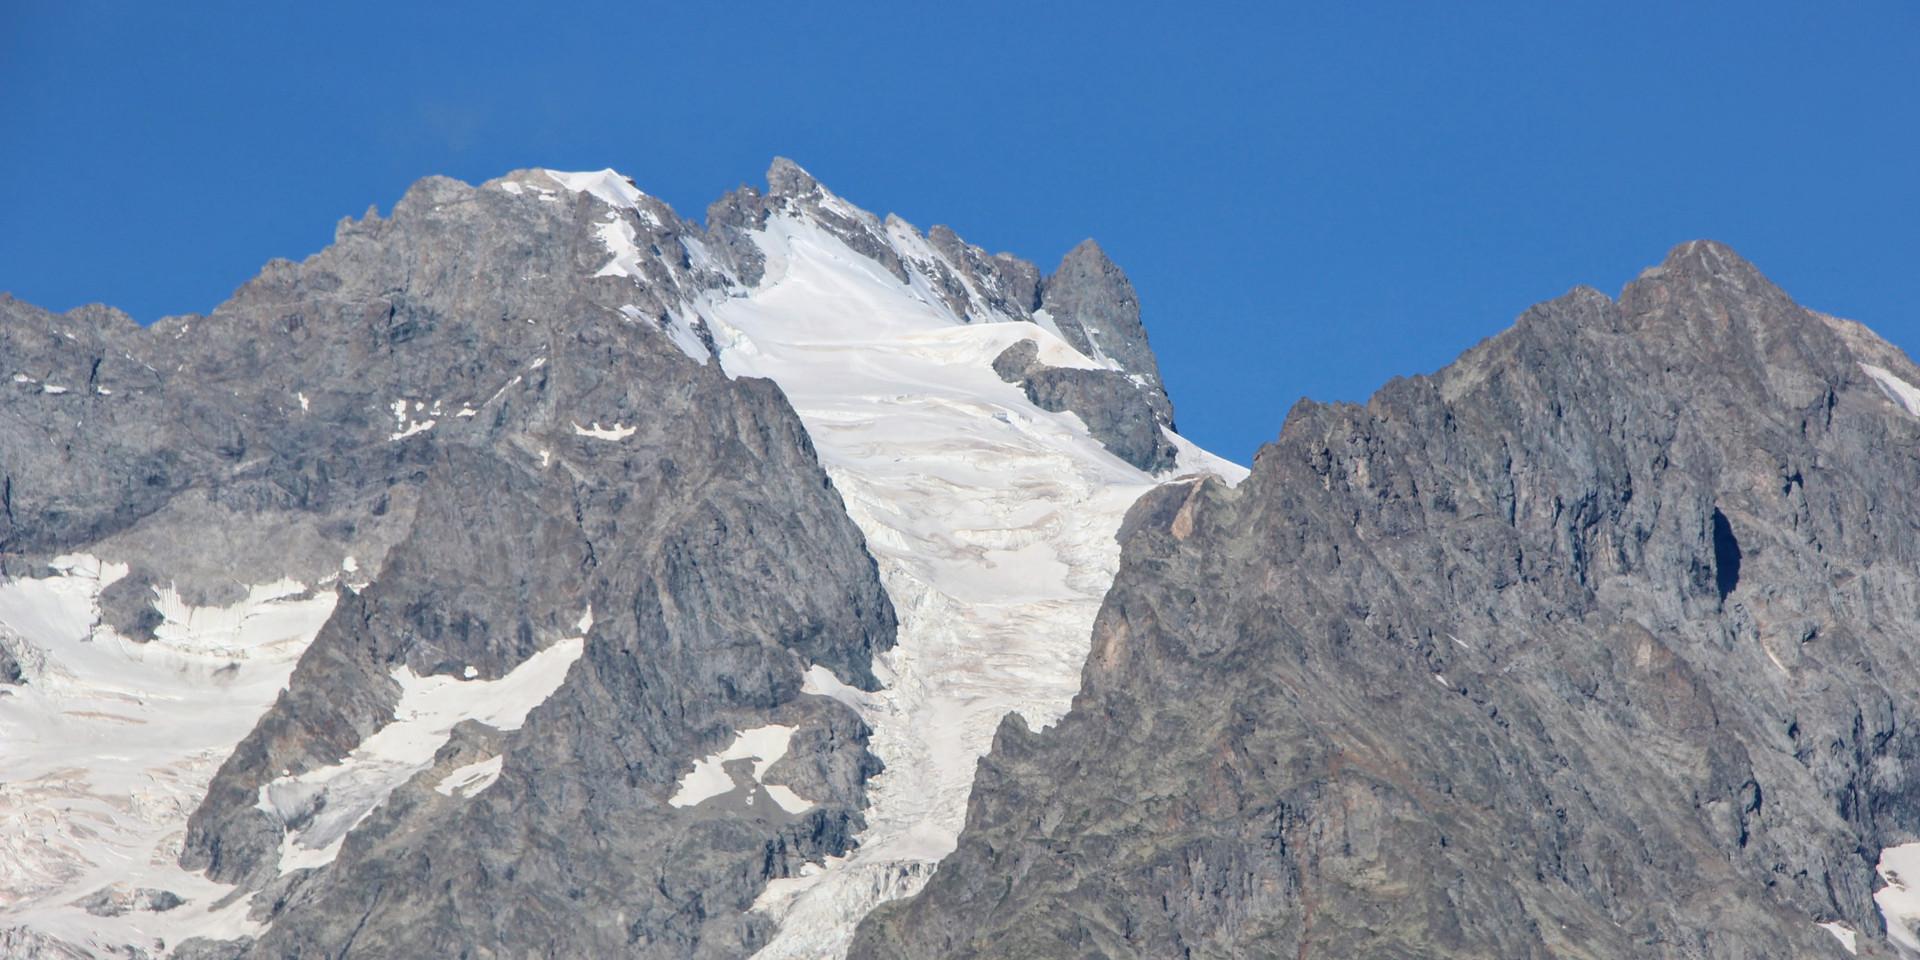 La reine Meije (3973 m)